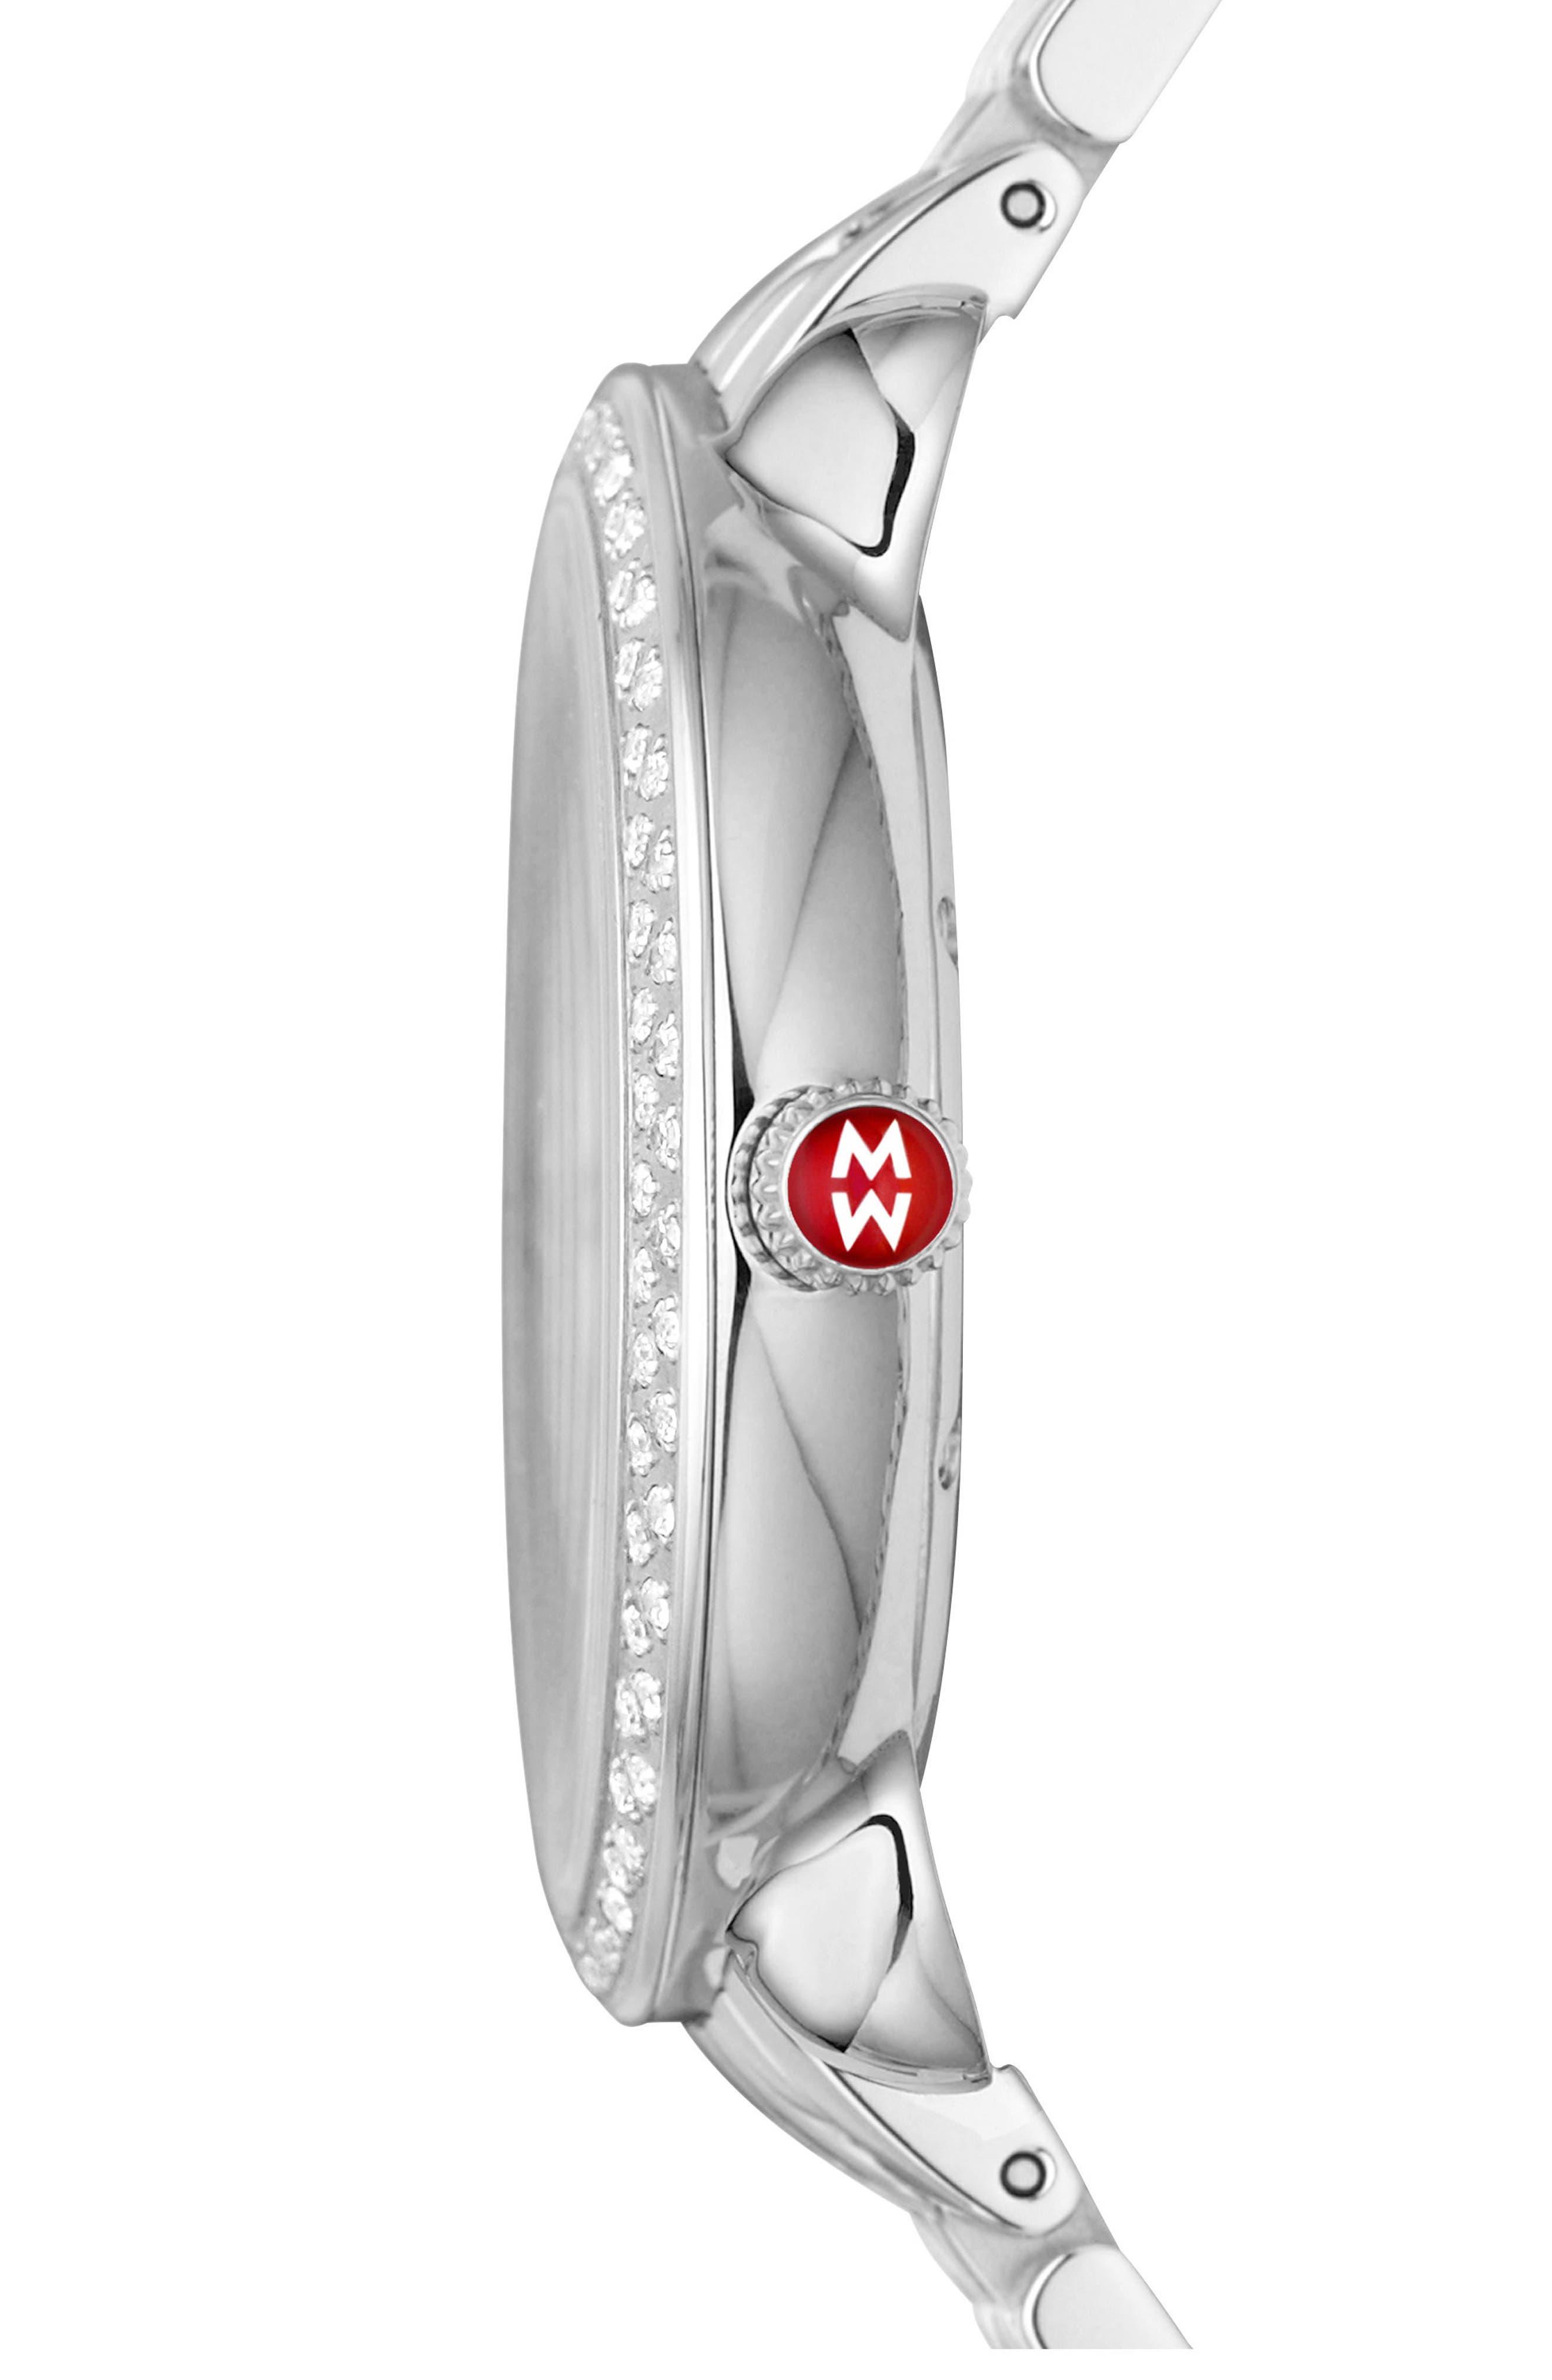 Serein Watch Head, 40mm x 38mm,                             Alternate thumbnail 2, color,                             Teal/ Silver